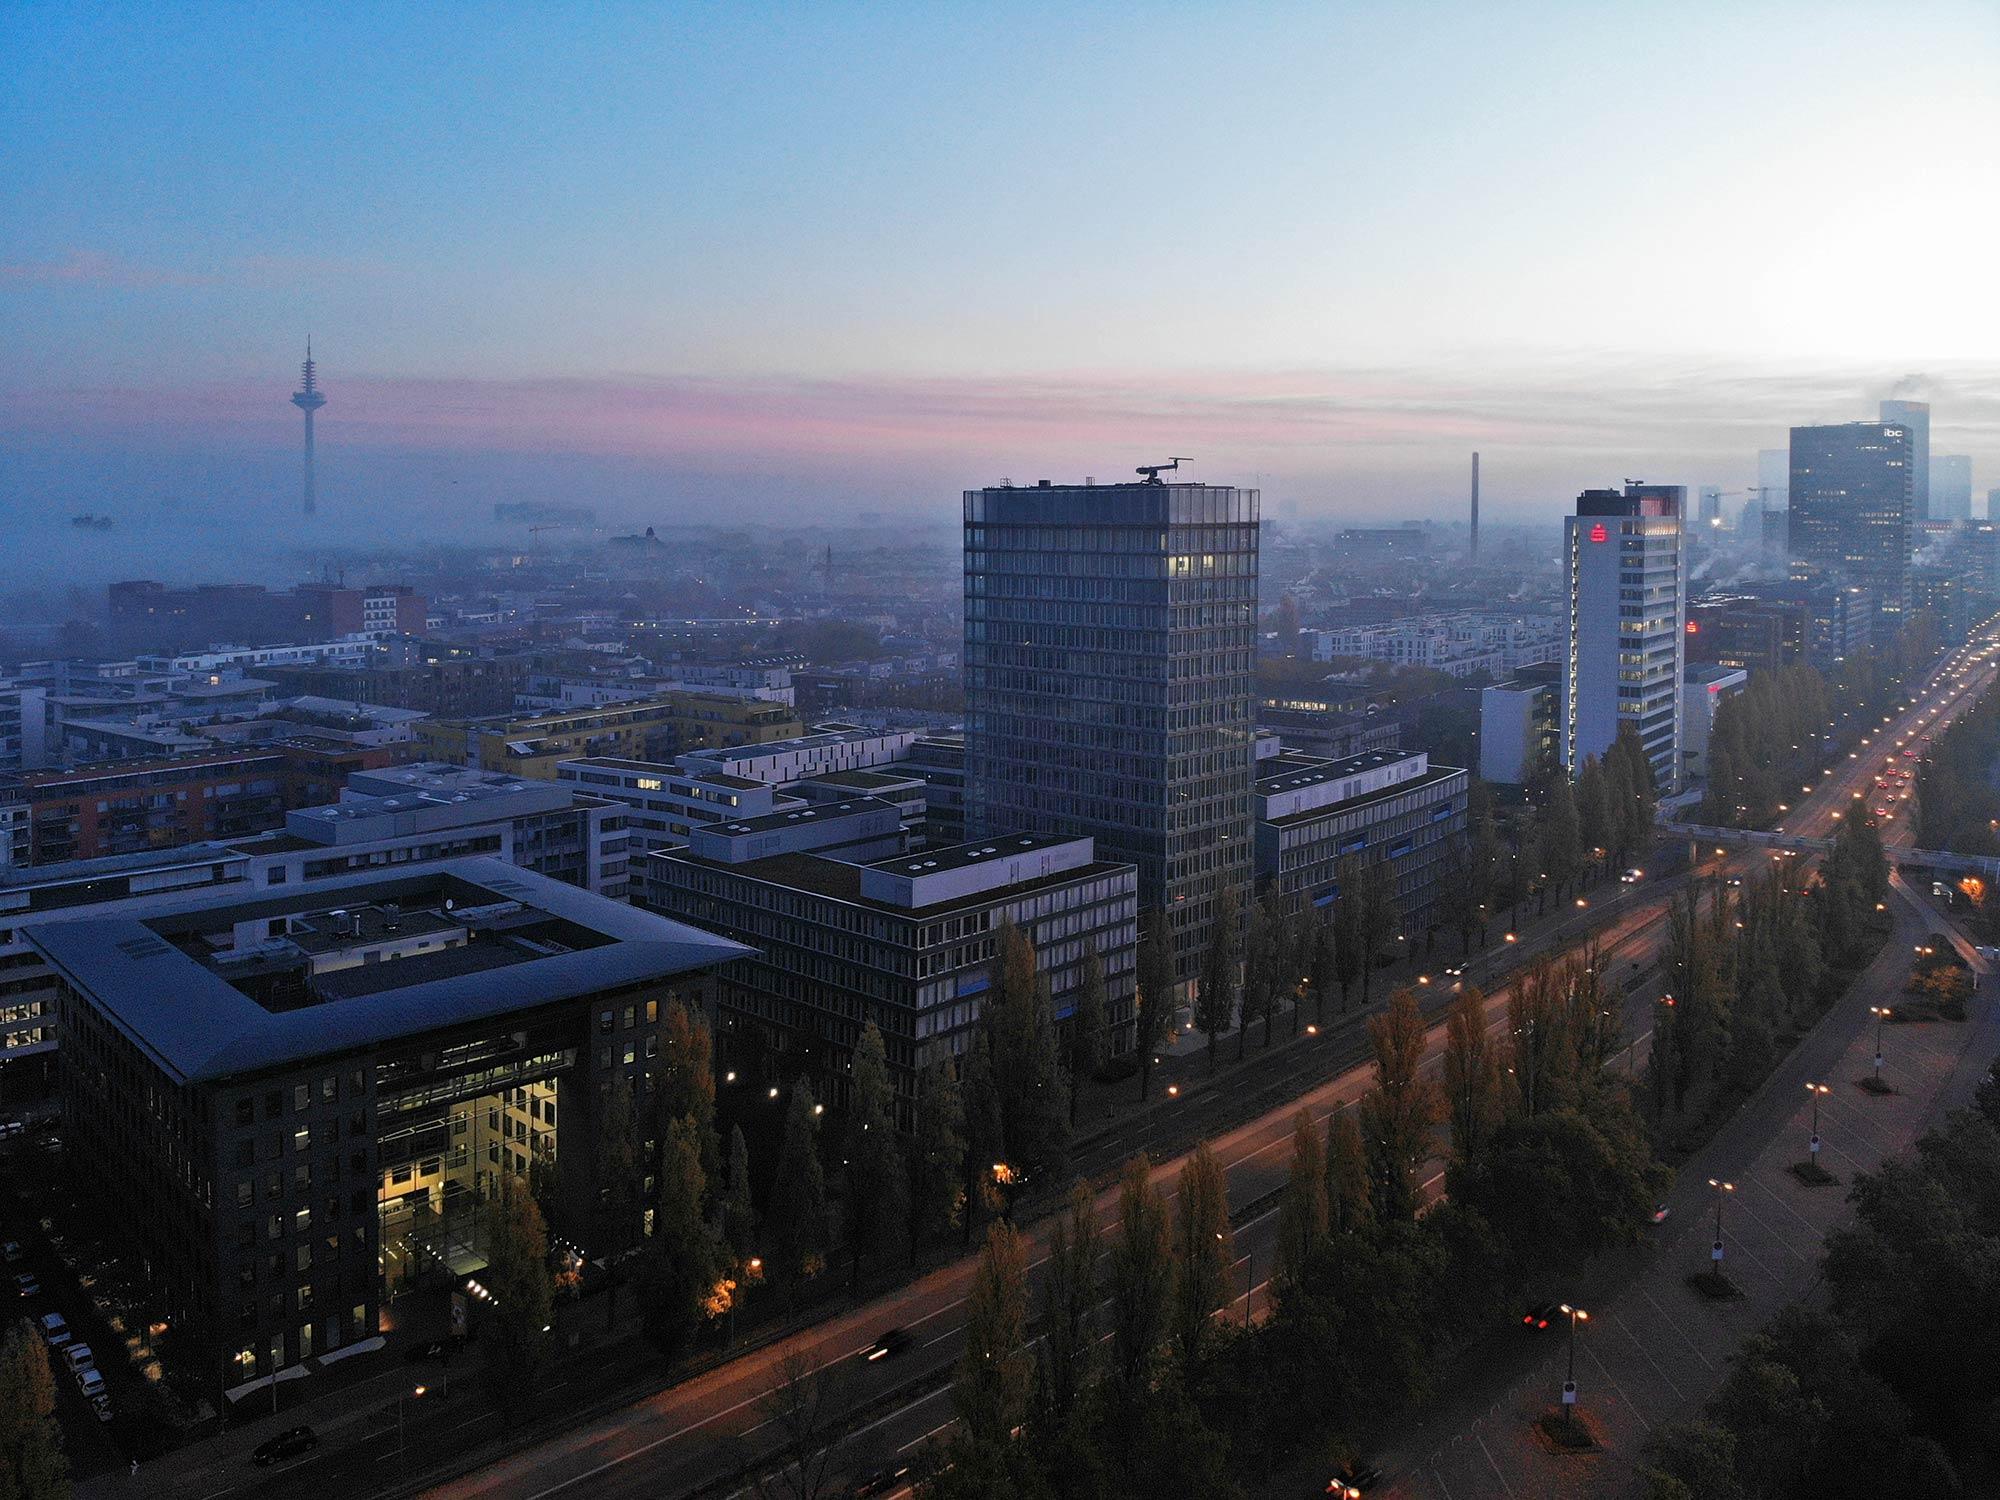 Cielo Frankfurt am Main - City West Hochhaus - Luftaufnahme Cielo - Drohnenaufnahme Cielo - Panorama FFM